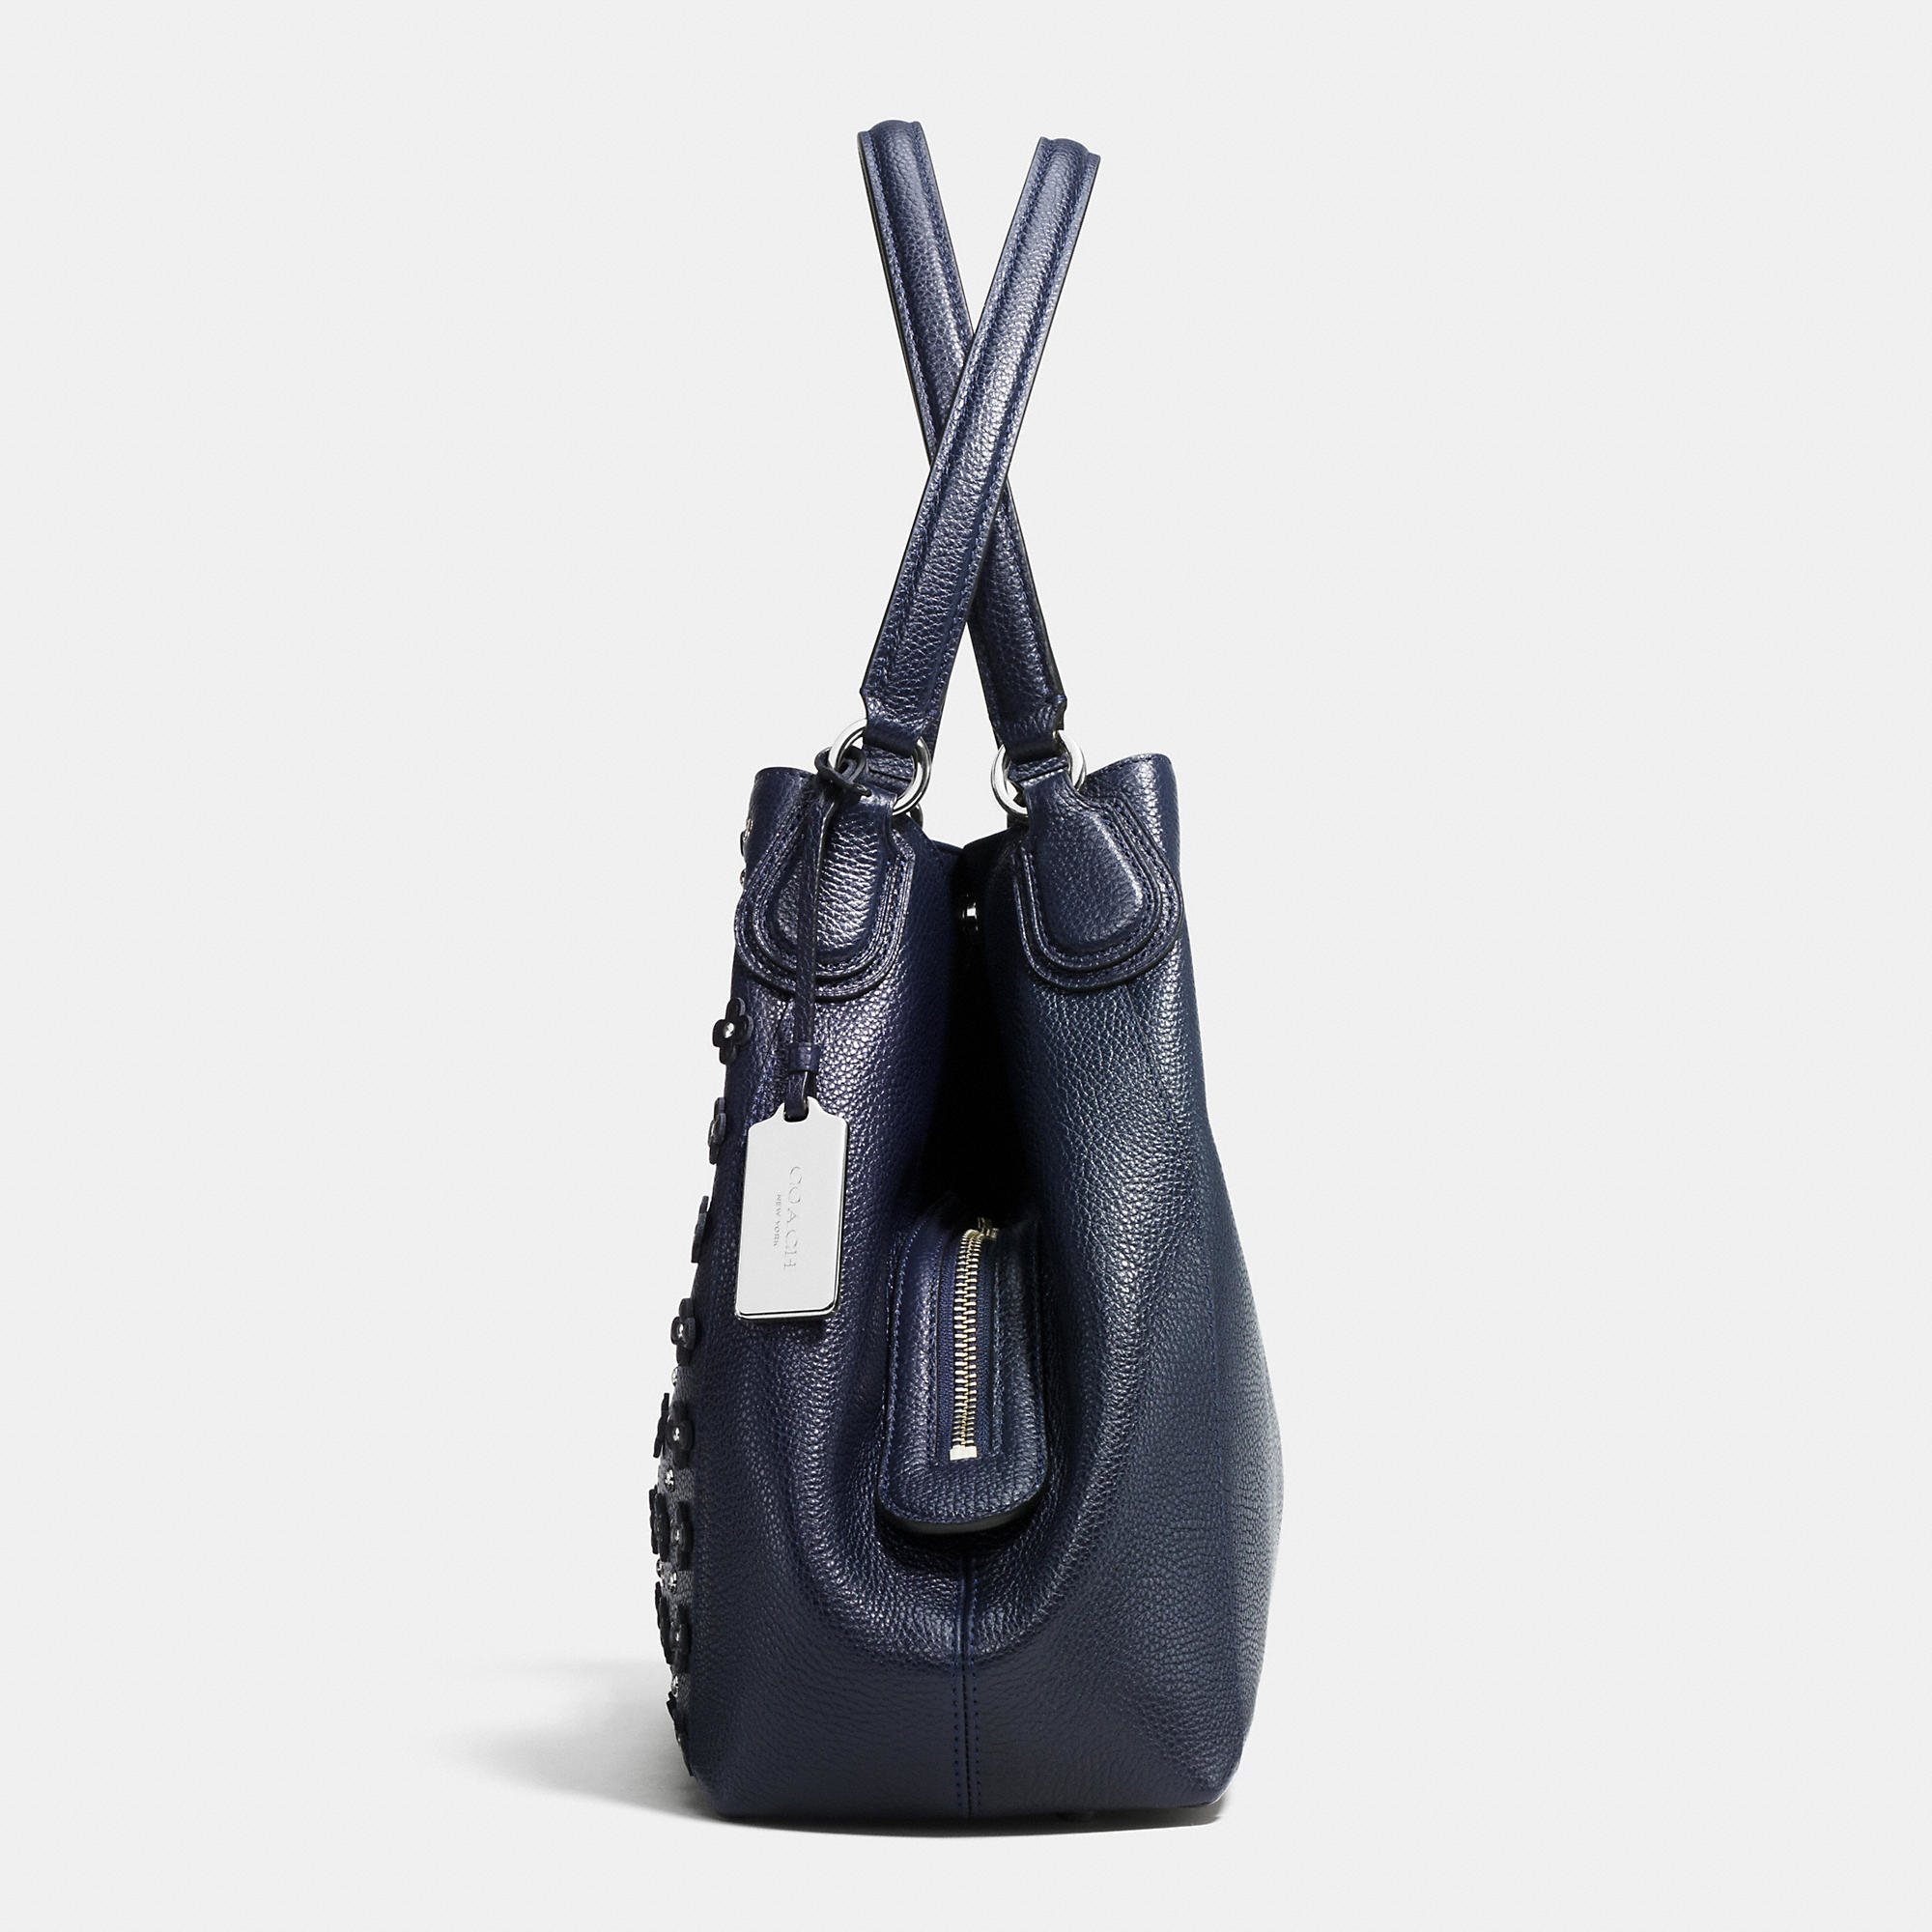 fe58014ba8db coach edie shoulder bag 31 in floral rivets leather